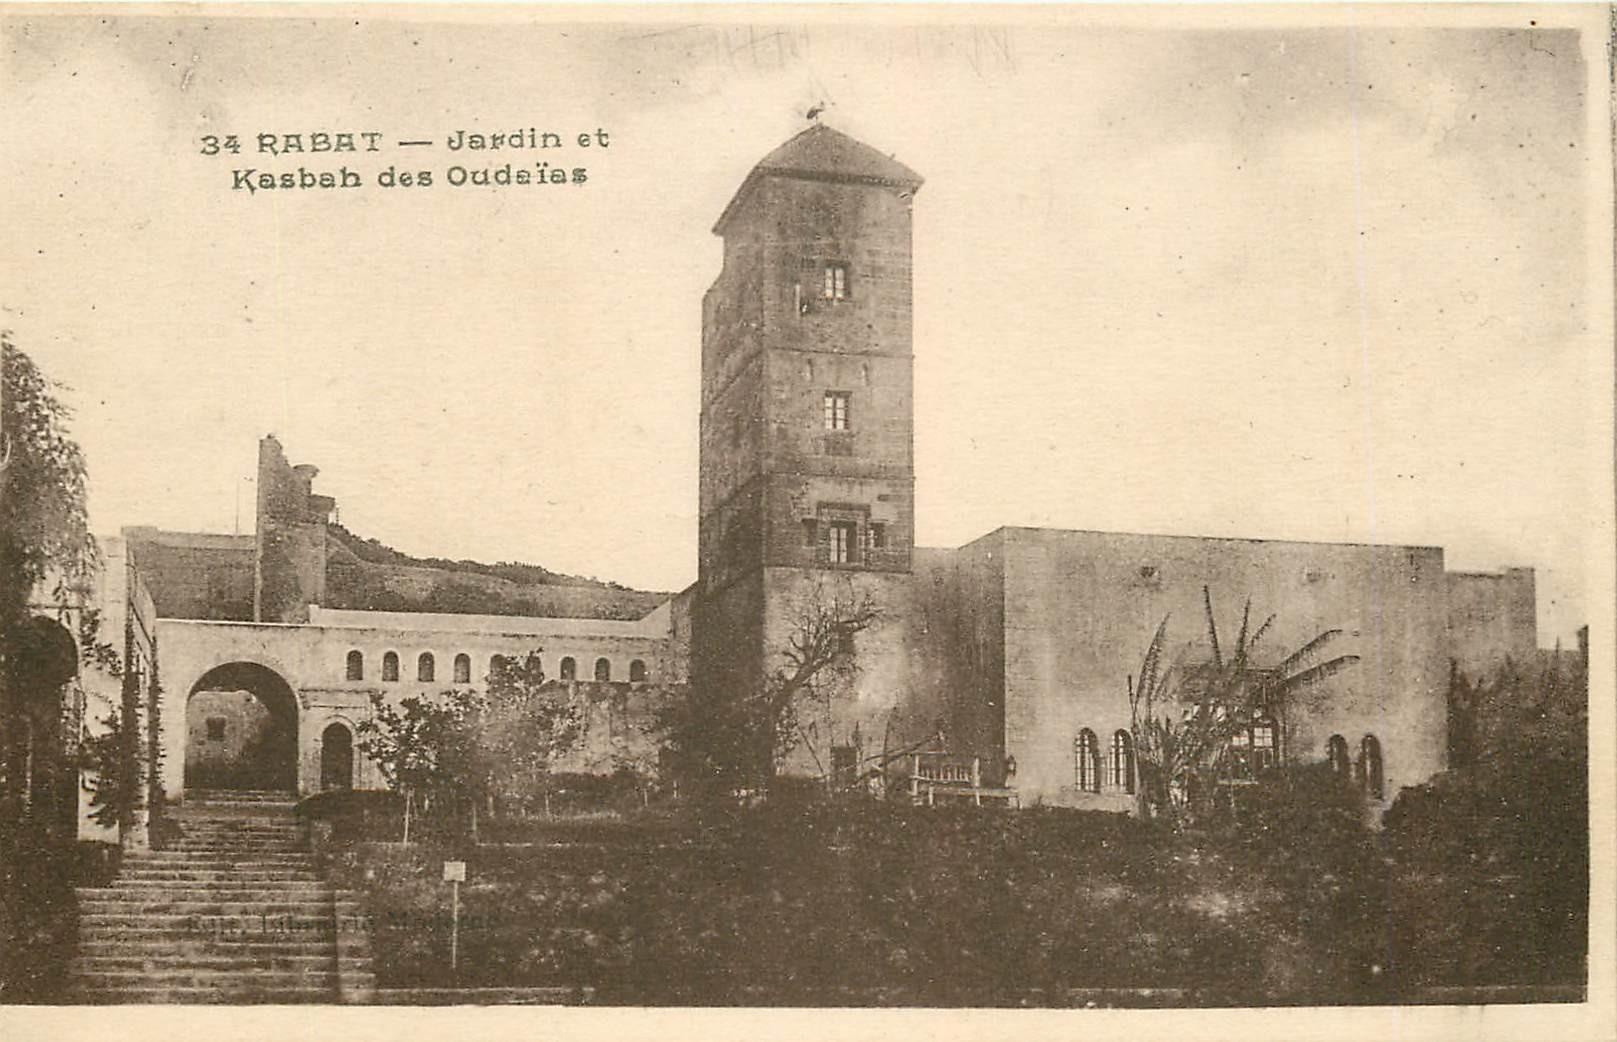 WW RABAT. Jardin et Kasbah des Oudaïas